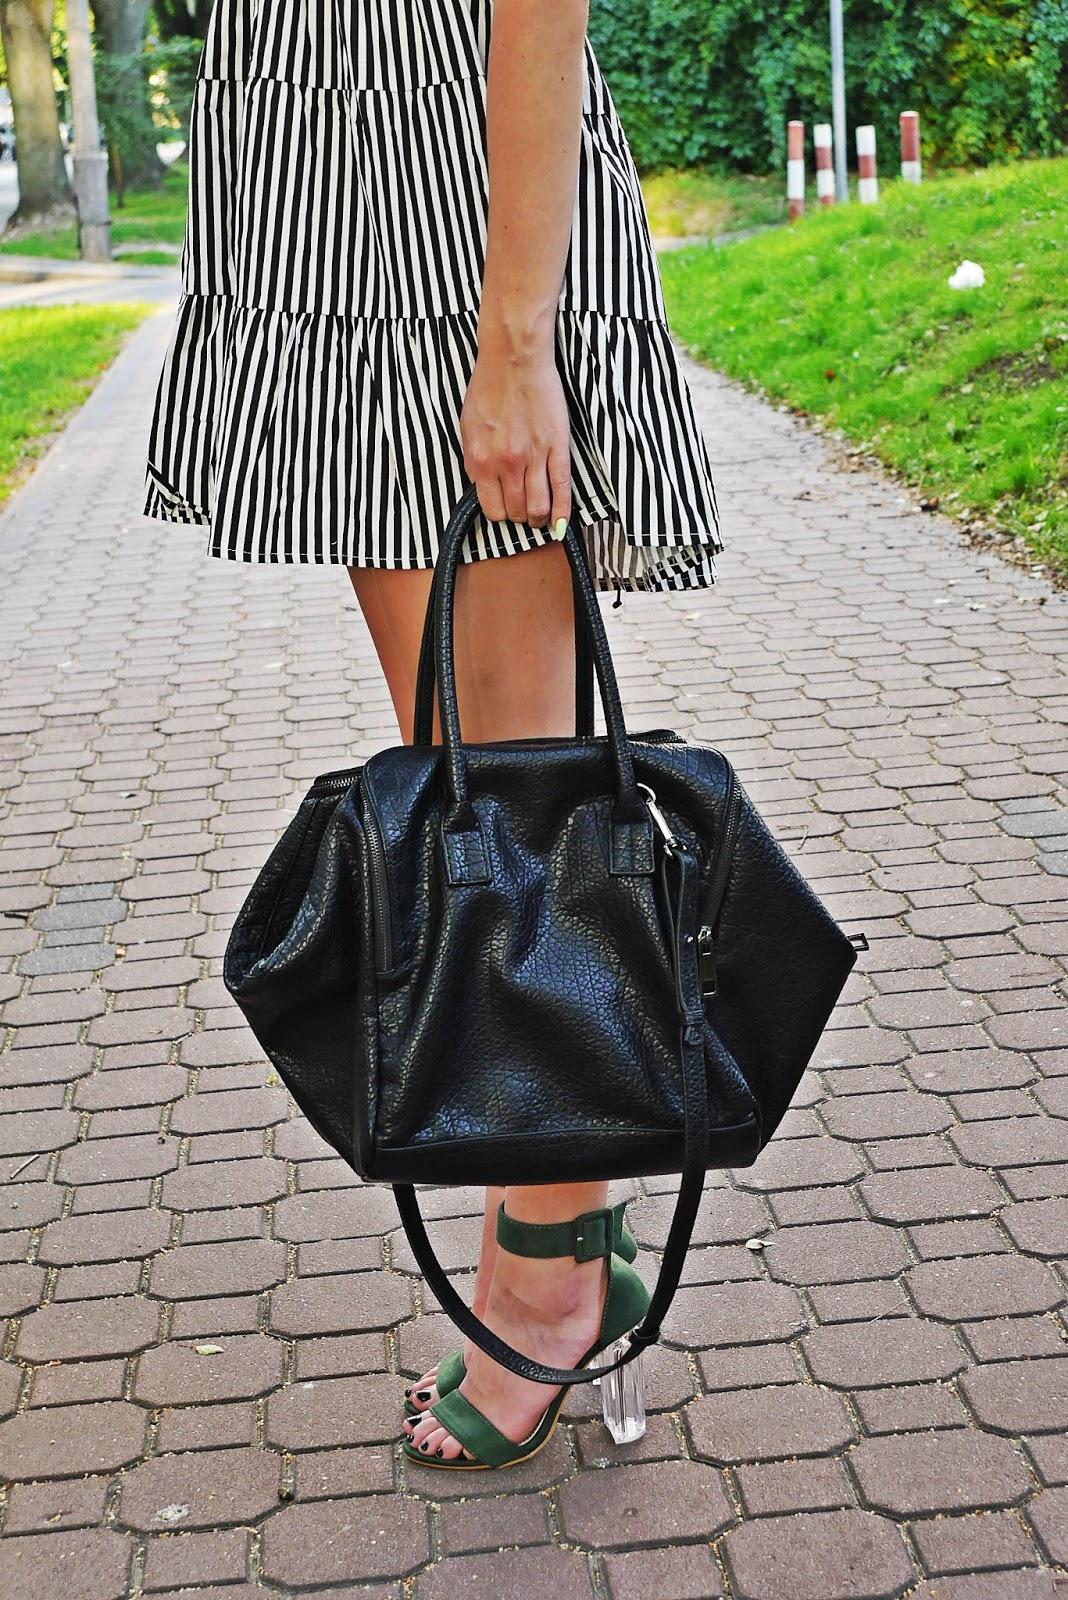 stripes_dress_green_heels_ootd_look_karyn_blog_010817a